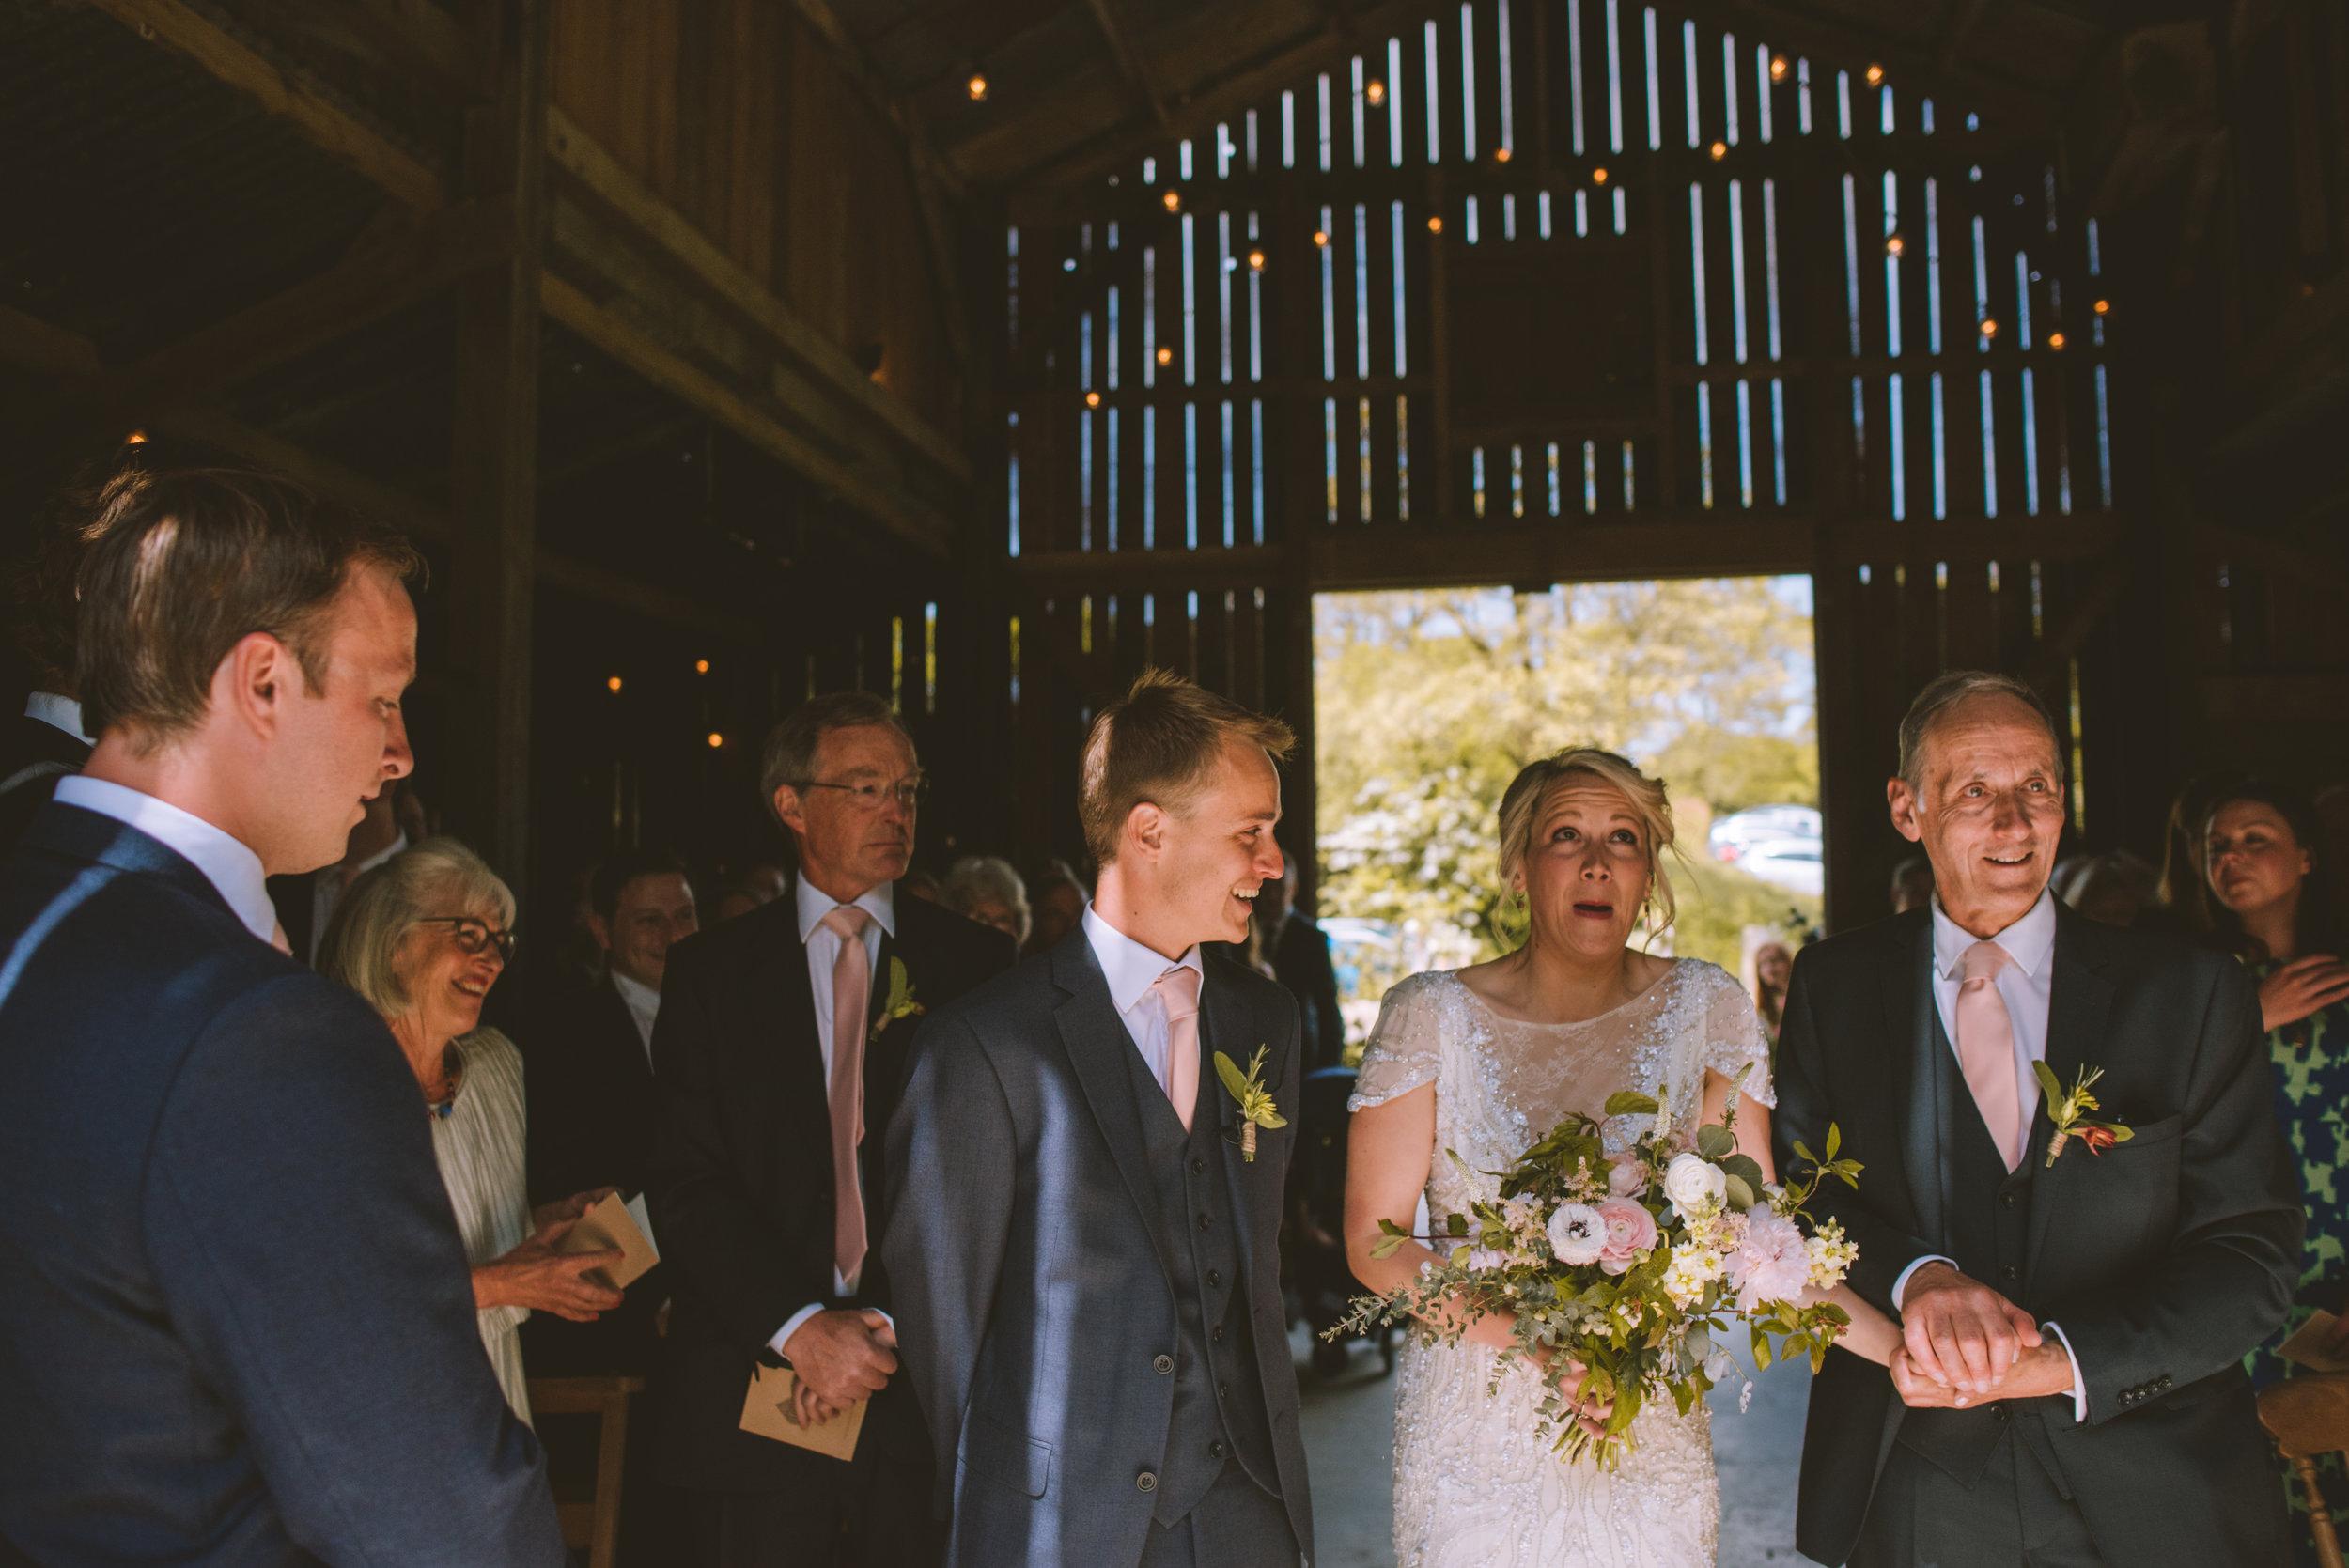 nancarrow-wedding-photography-32.jpg